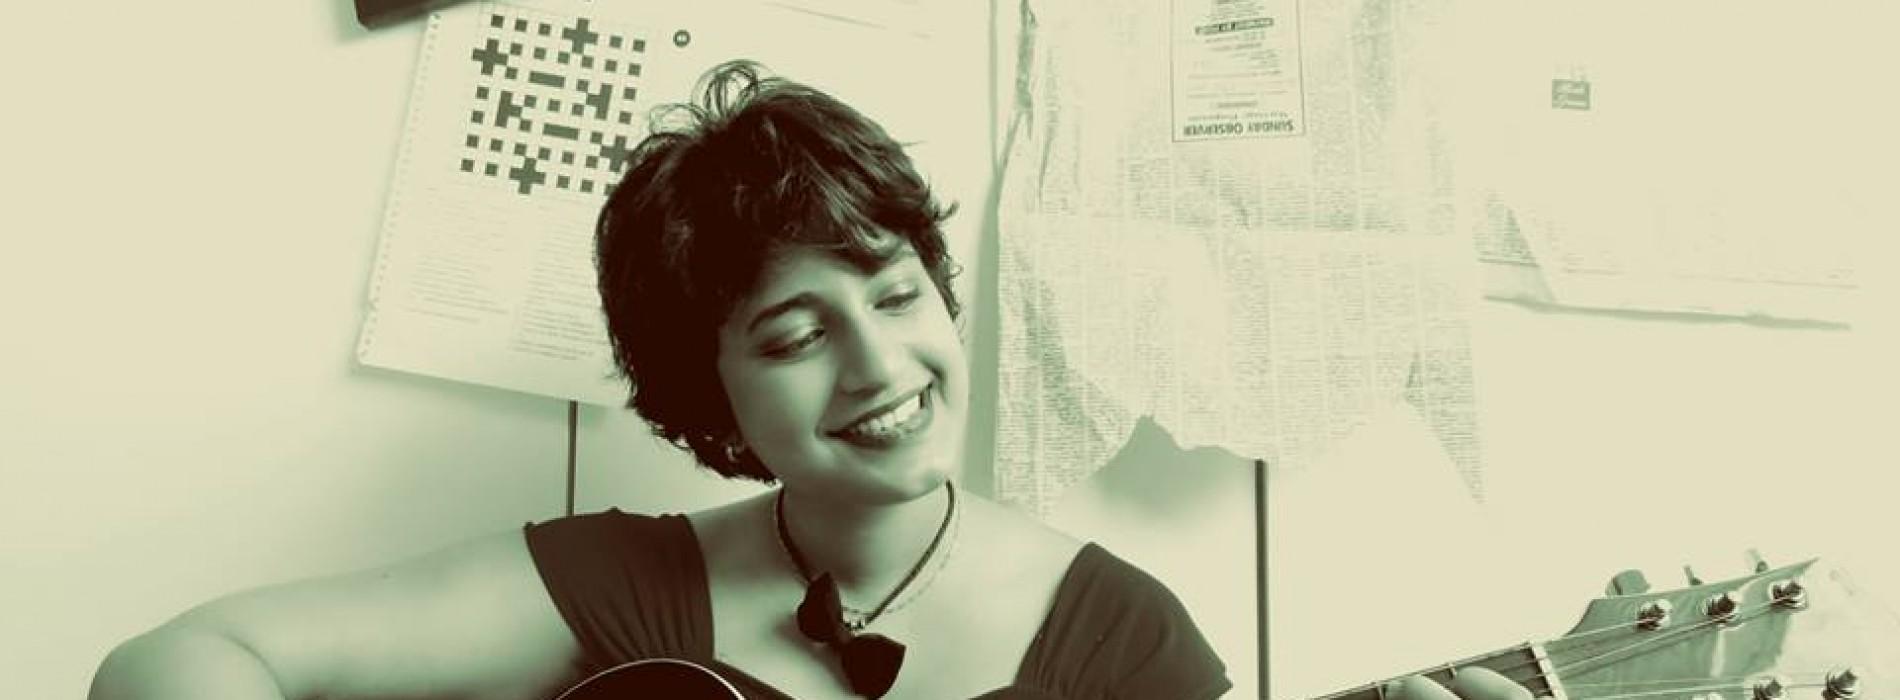 Hirushi Jayasena Has Her Debut Single Coming Out